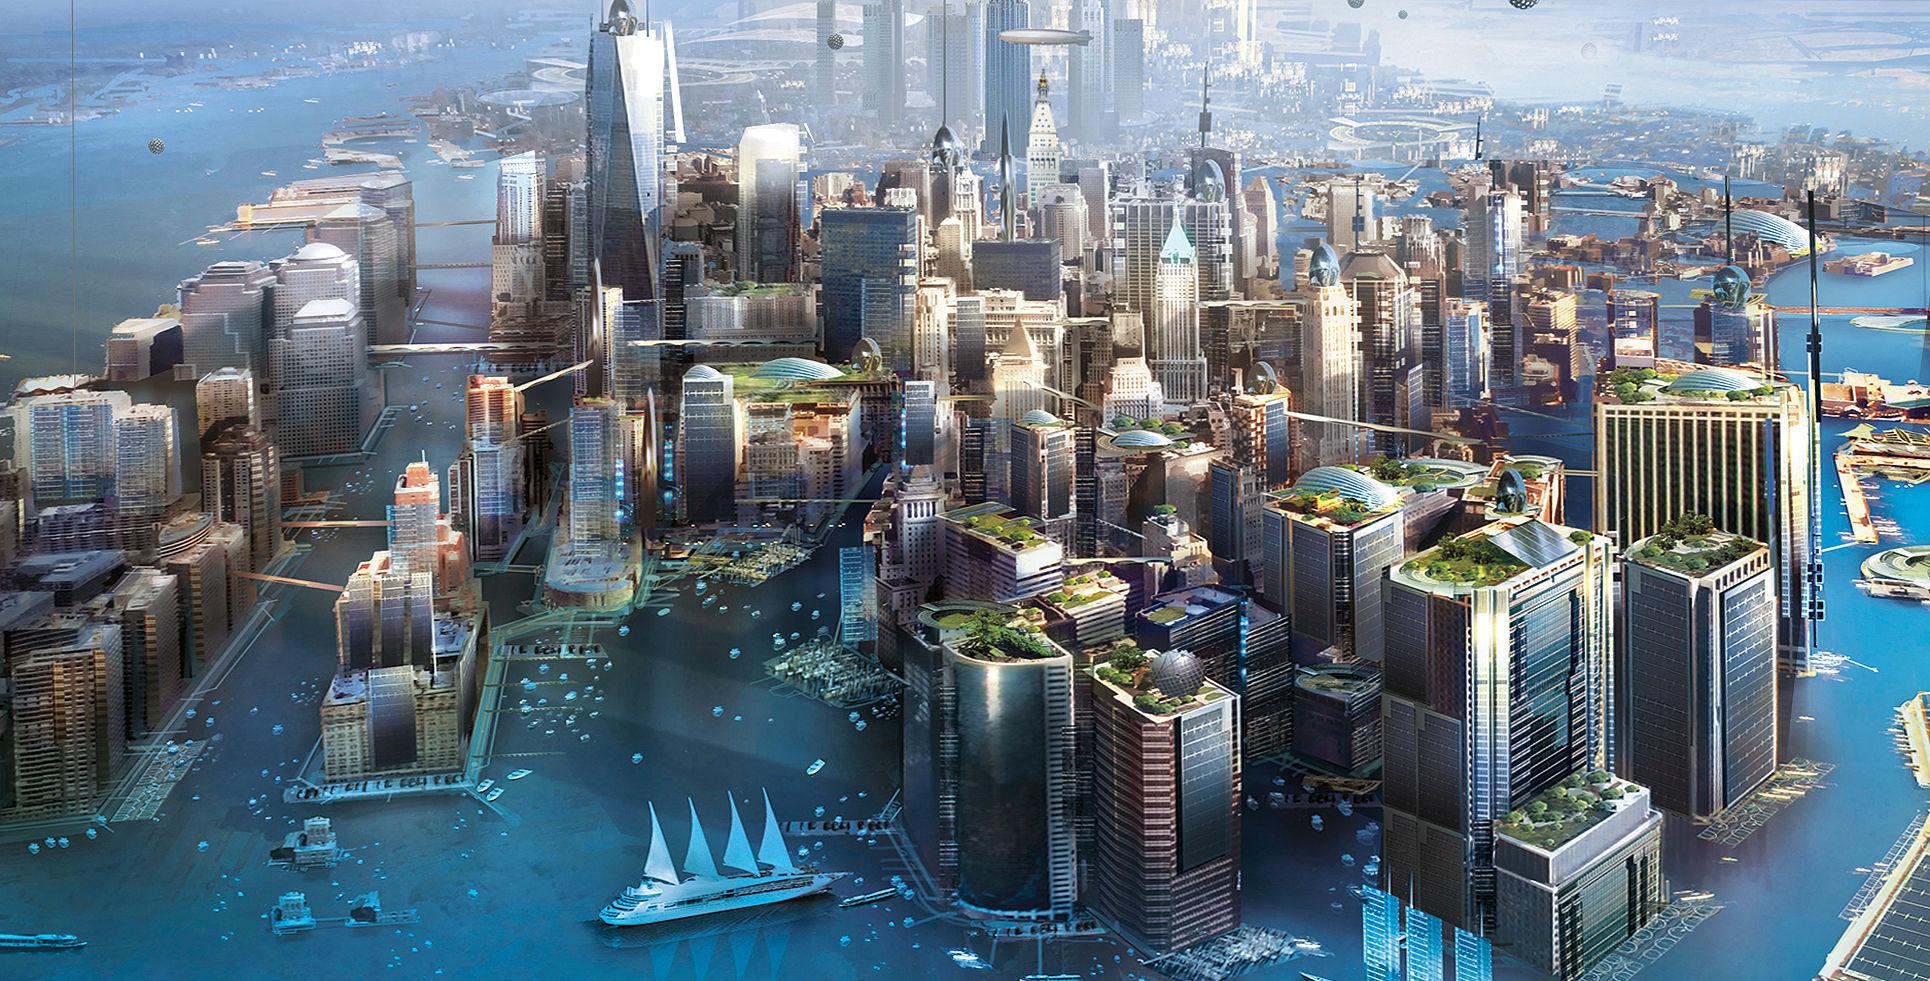 iklim krizi kim stanley robinson new york 2140